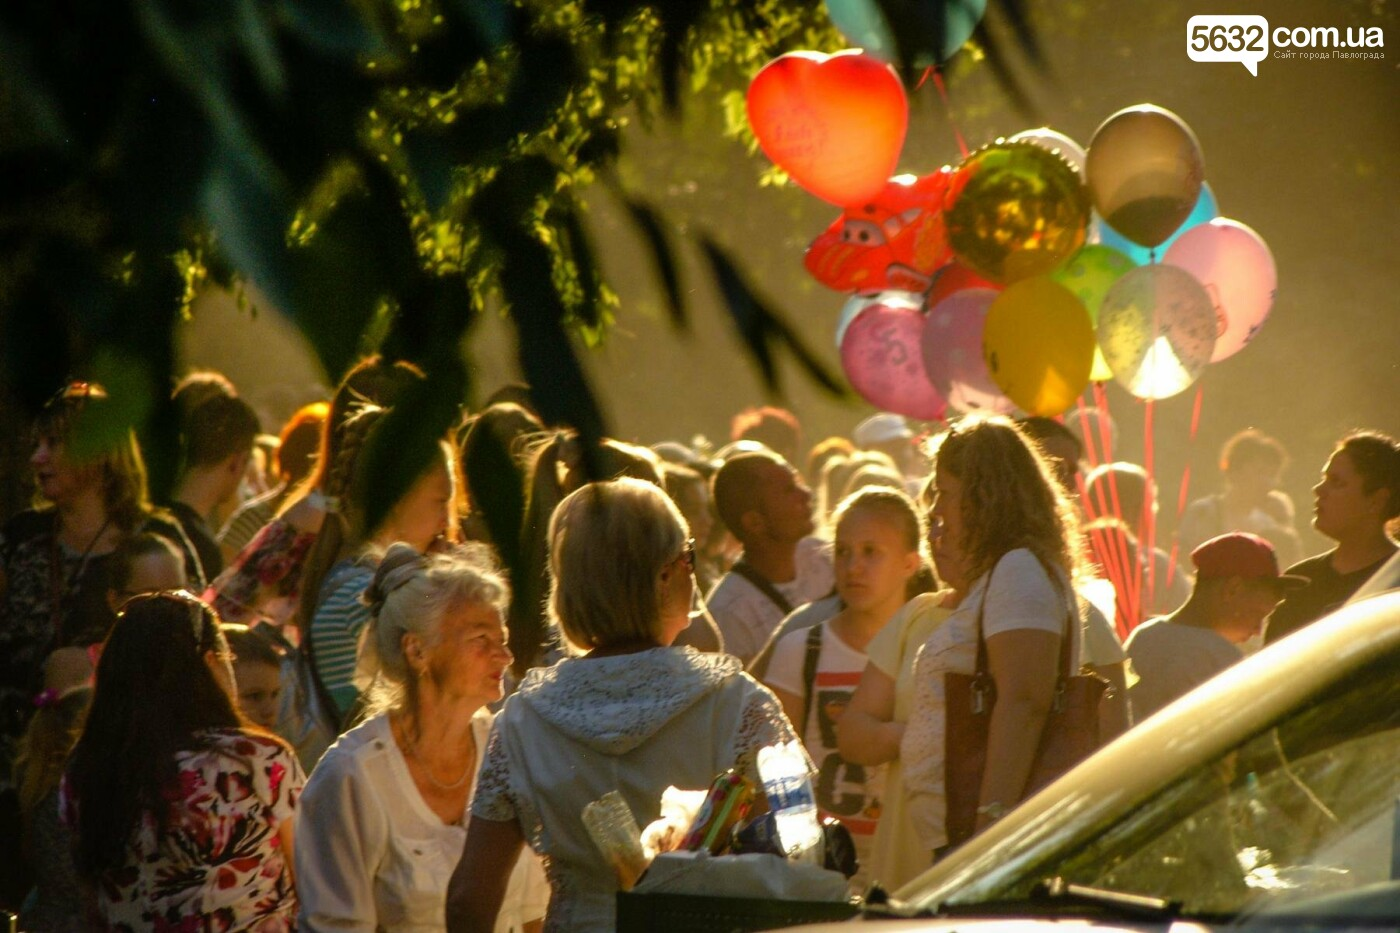 Как в Павлограде отпраздновали Ивана Купала, фото-5